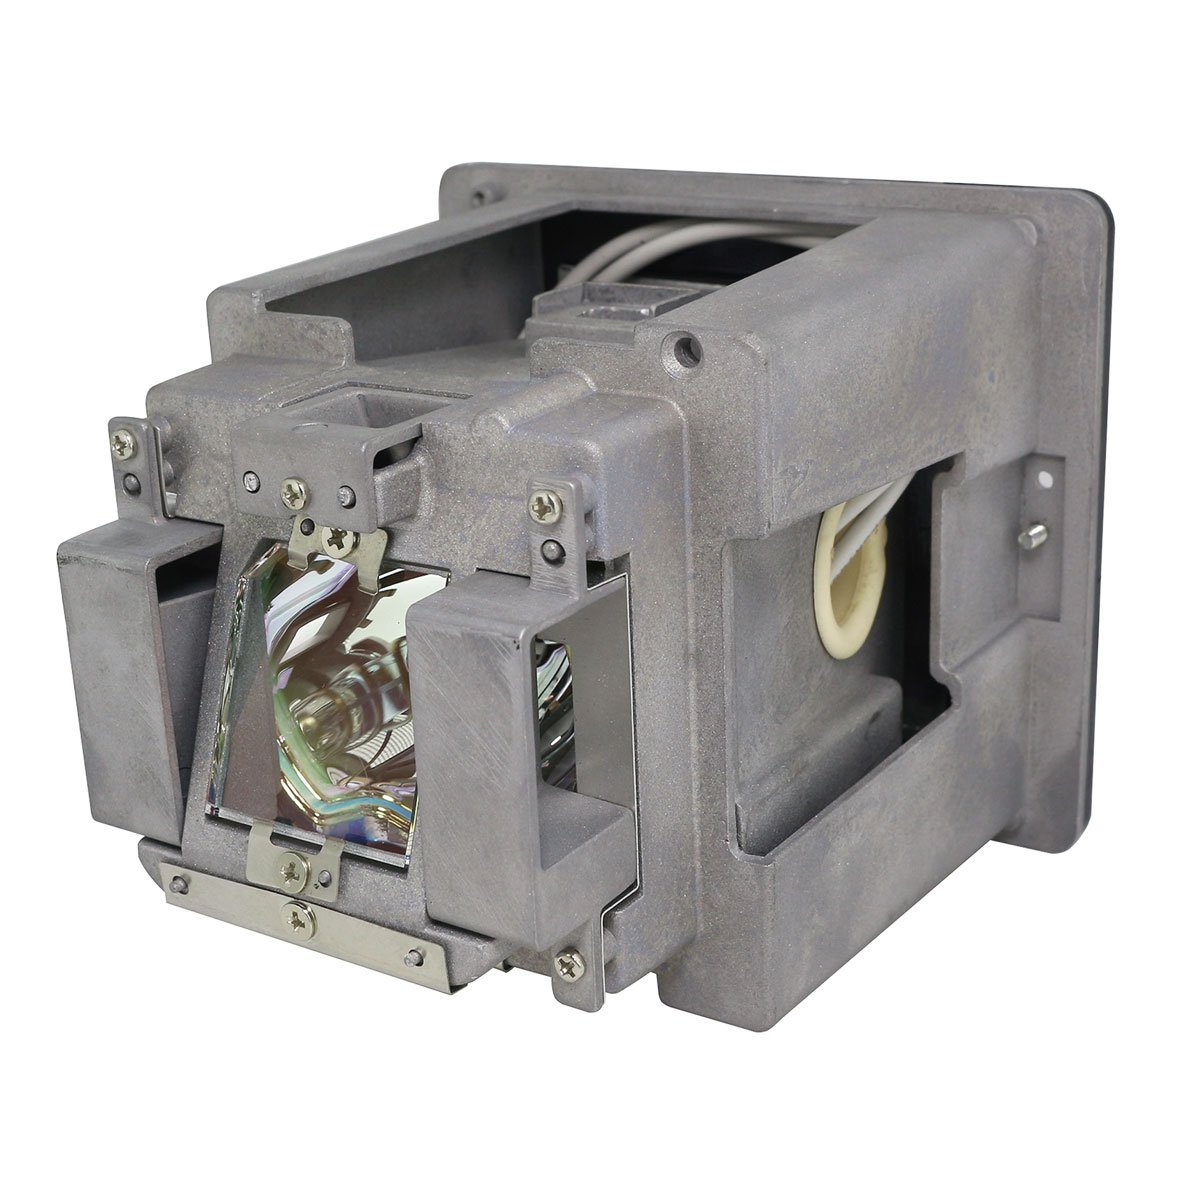 SpArc プロジェクター交換用ランプ 囲い/電球付き Optoma EX855用 Platinum (Brighter/Durable) Platinum (Brighter/Durable) Lamp with Housing B07MBW5HZ1